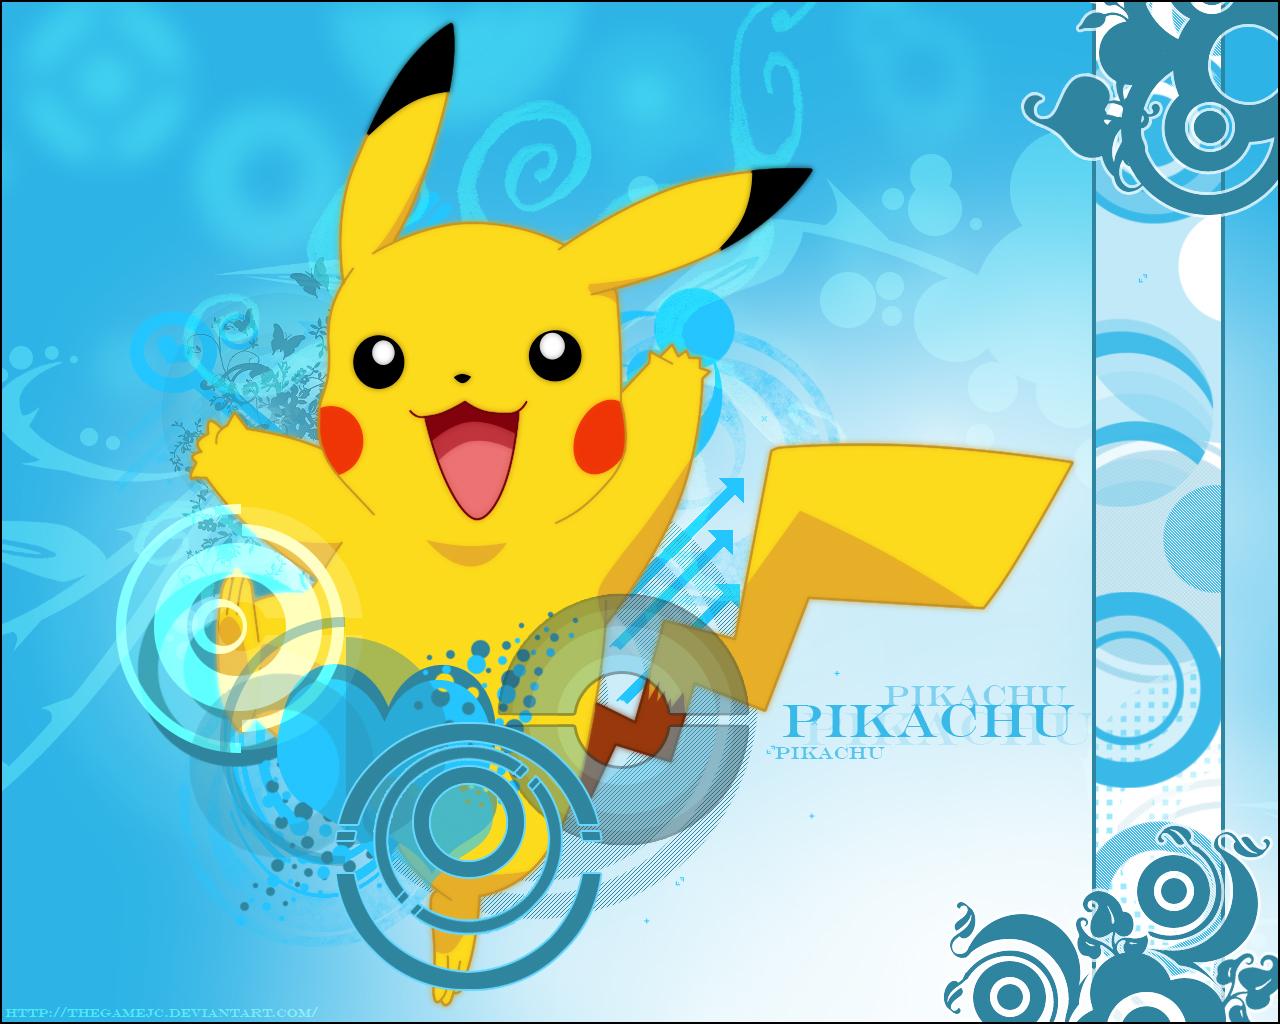 Pokemon Mobile Phone Wallpapers 99806 3707 Wallpaper Cool 1280x1024